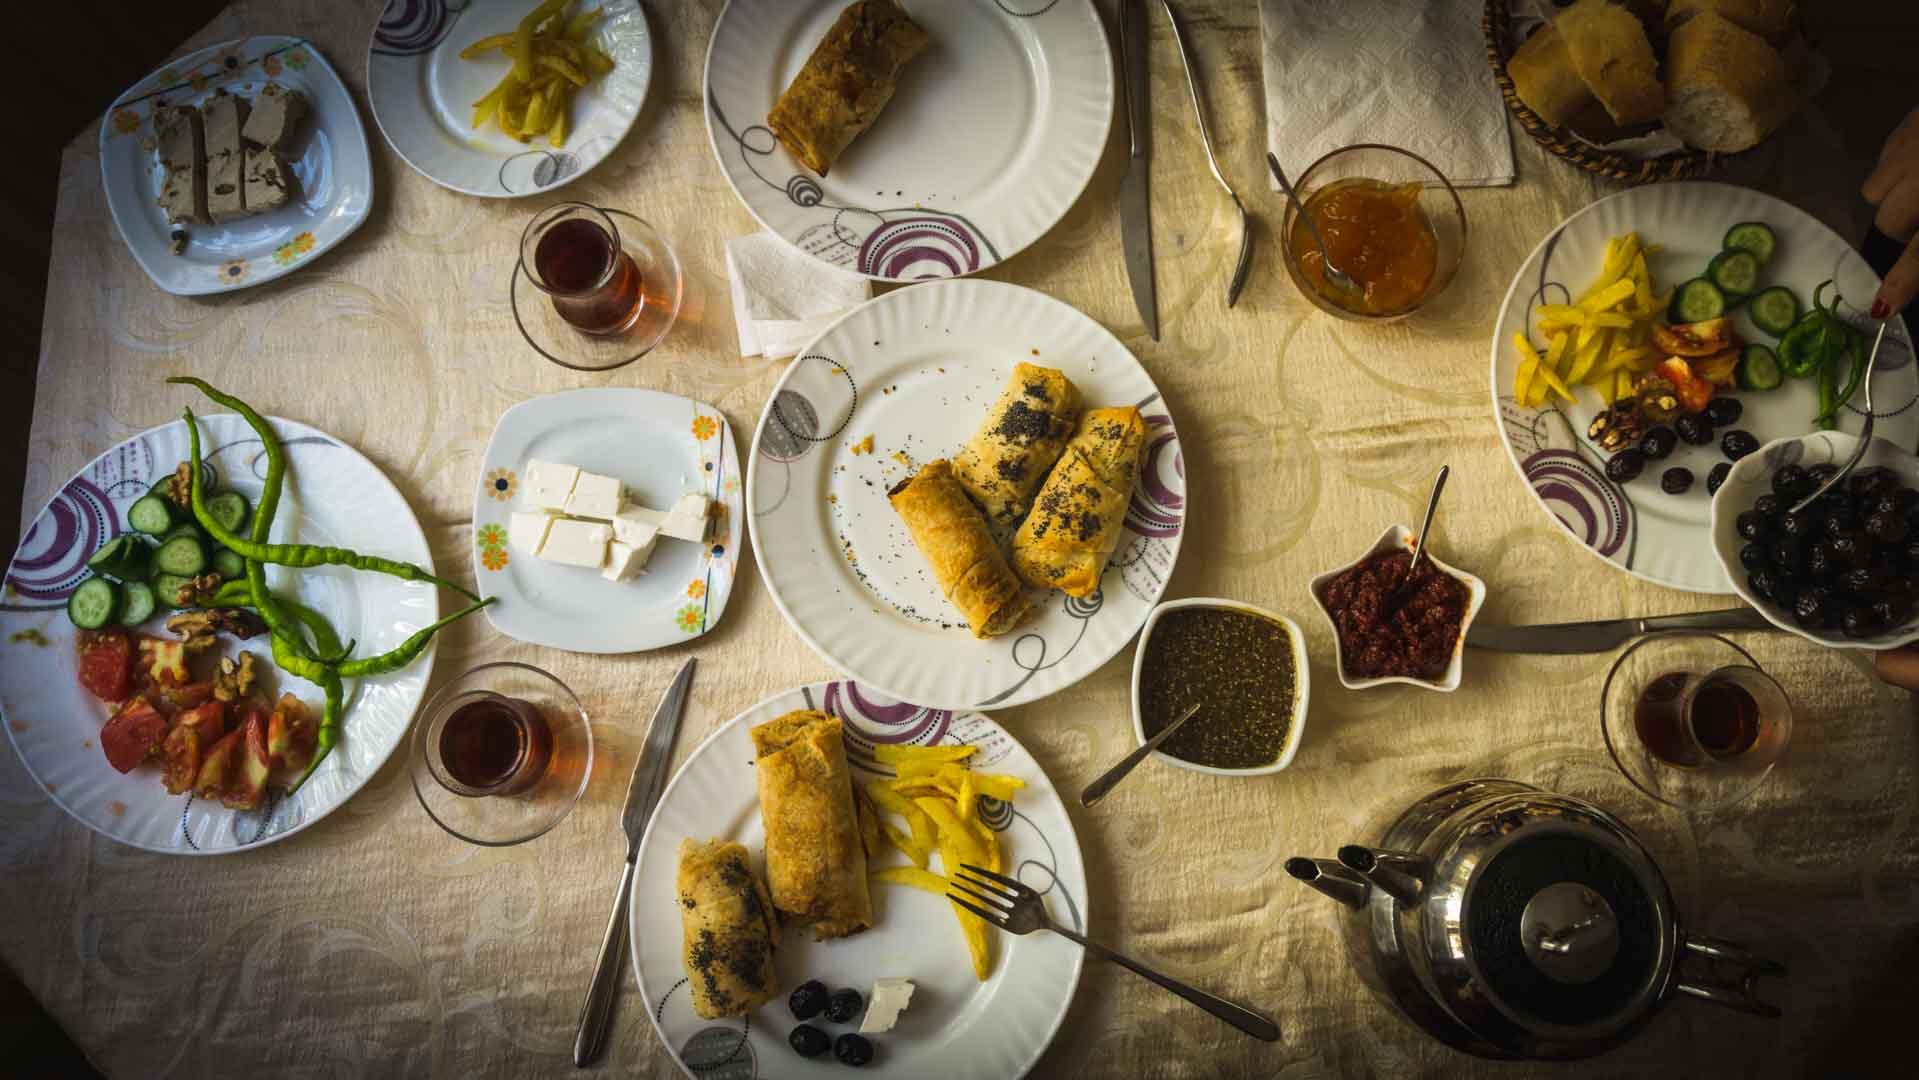 SerialHikers stop autostop world monde tour hitchhiking aventure adventure alternative travel voyage sans avion no fly recettes turques turkish recipes